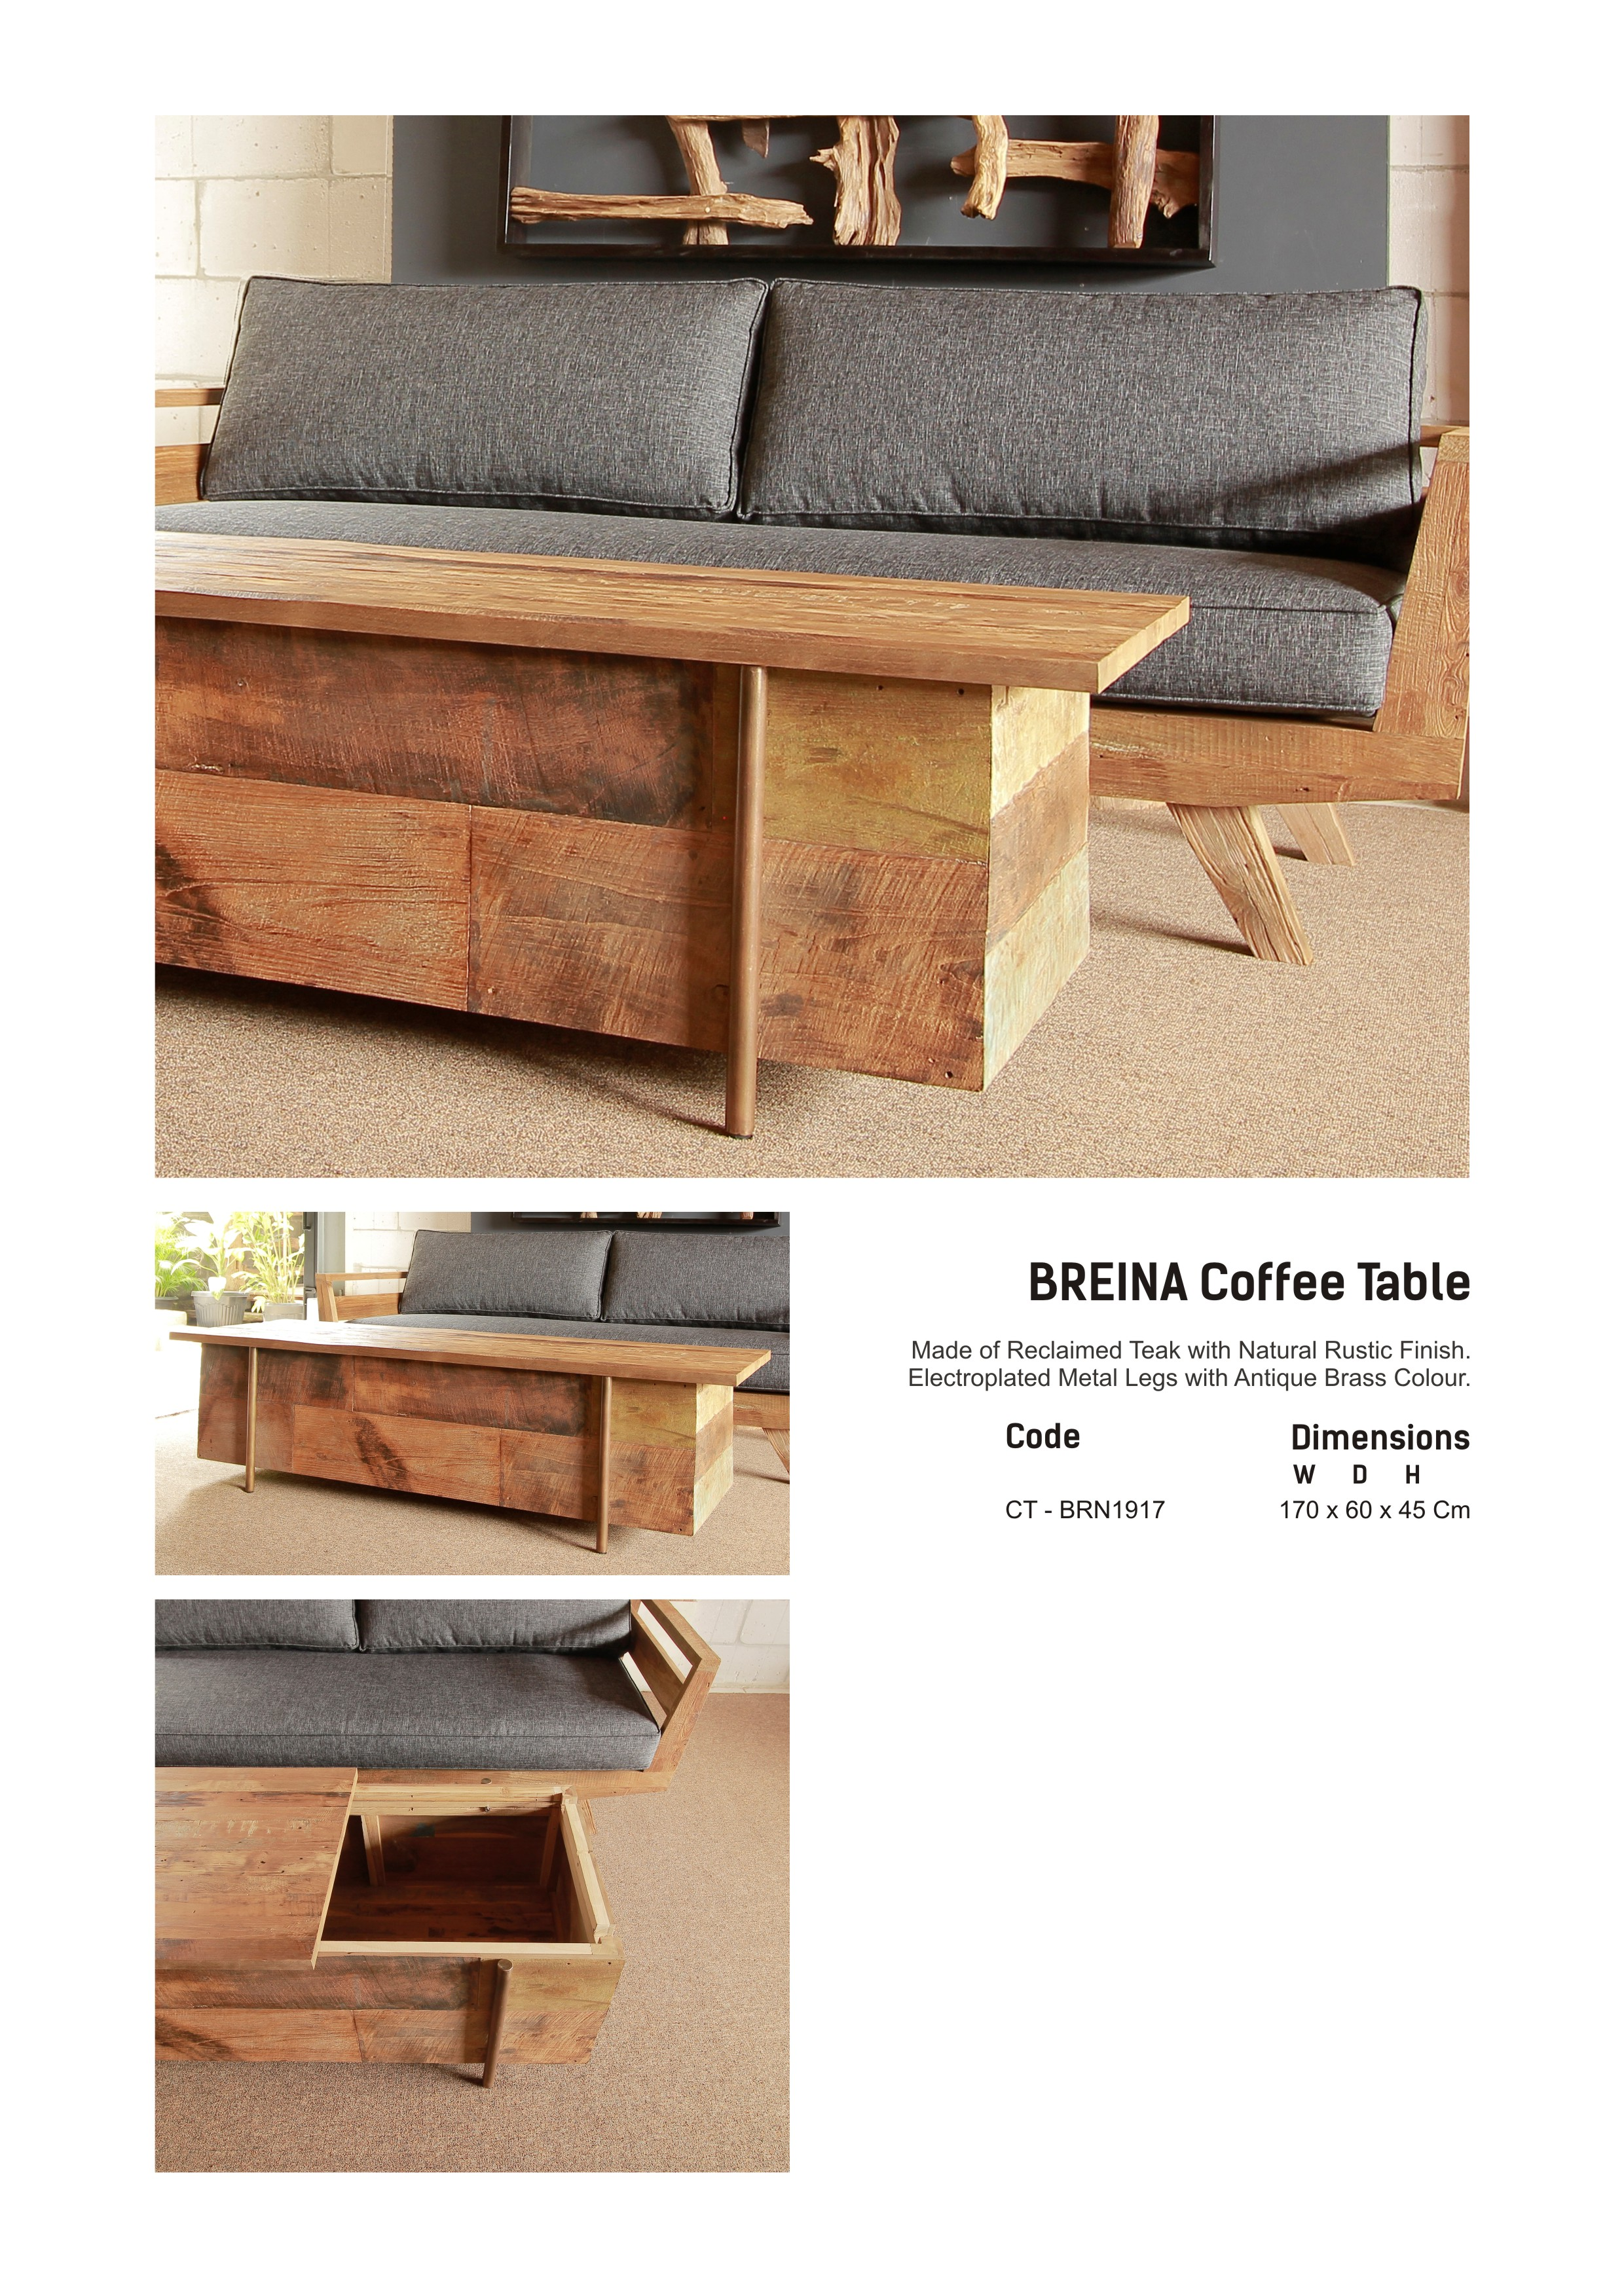 19. BREINA Coffee Table